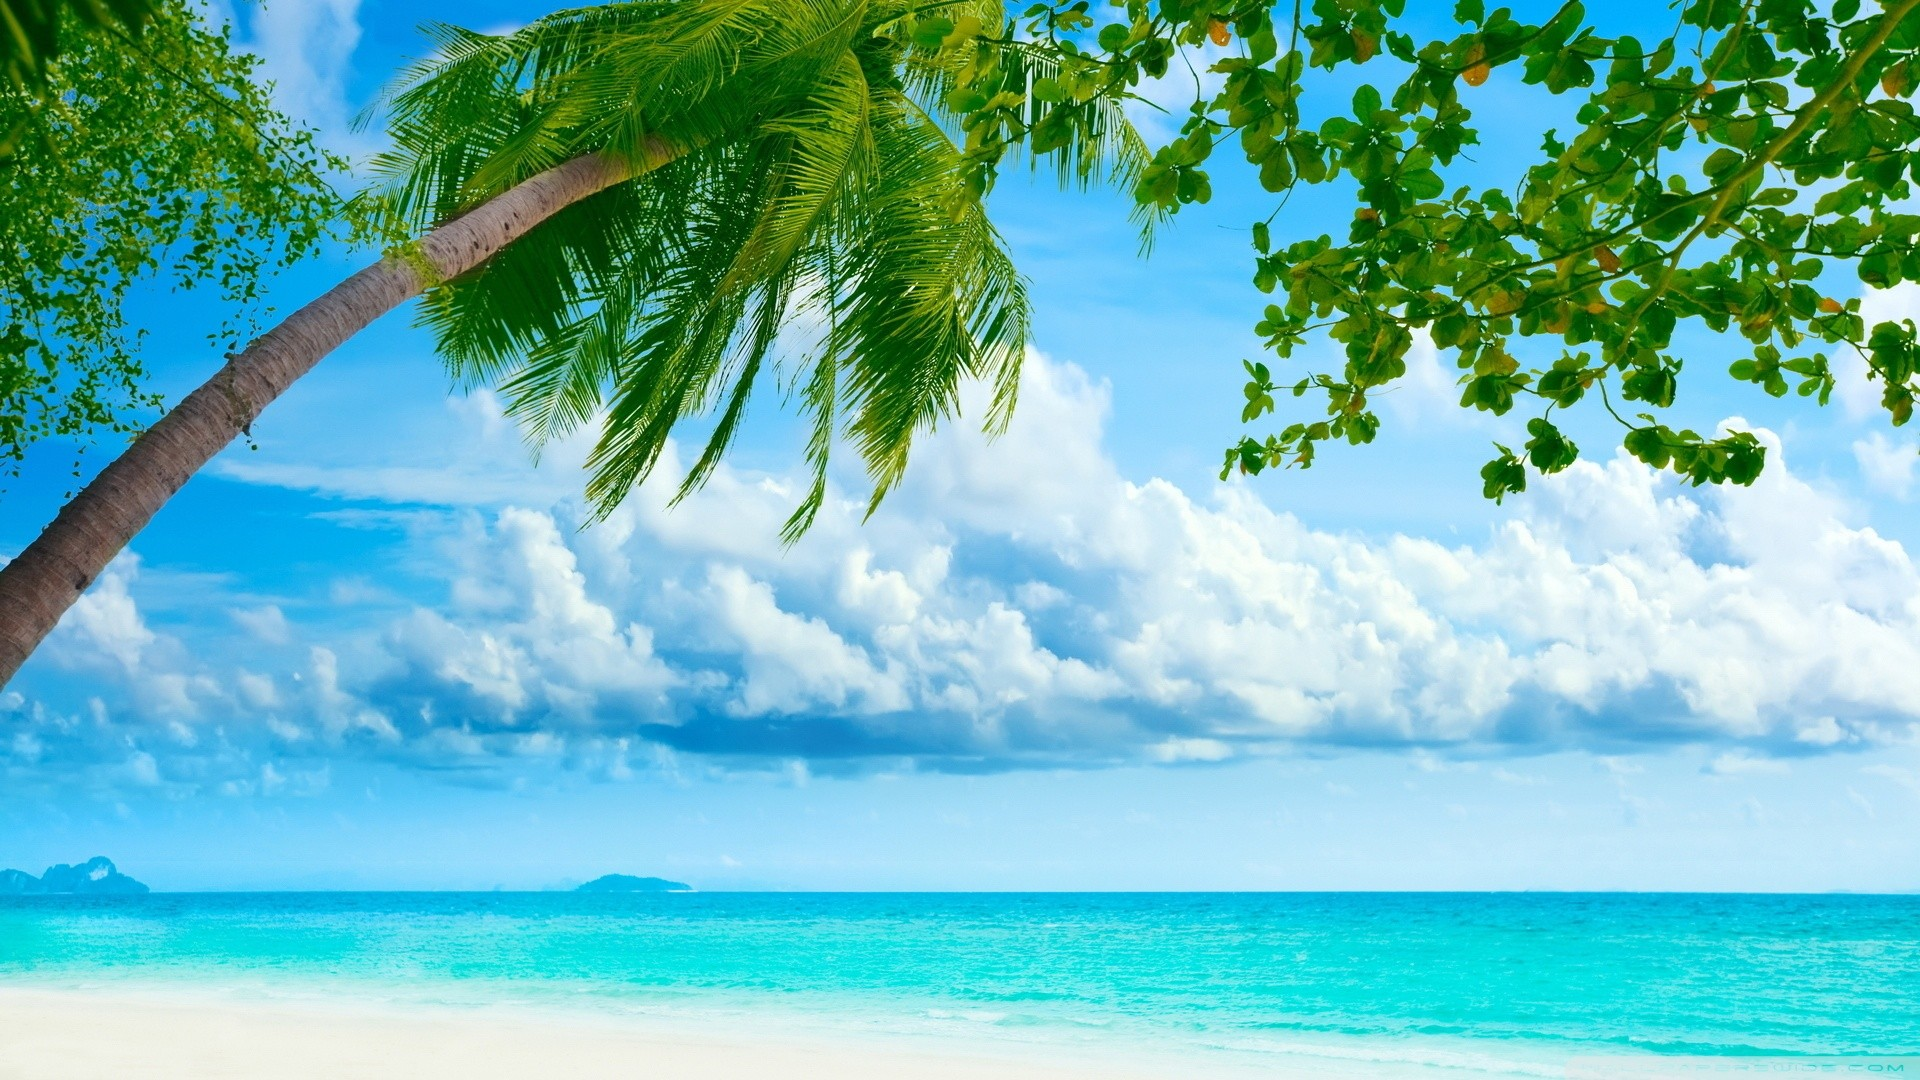 beach tropical hd wallpaper wallpapers55com   Best Wallpapers for 1920x1080